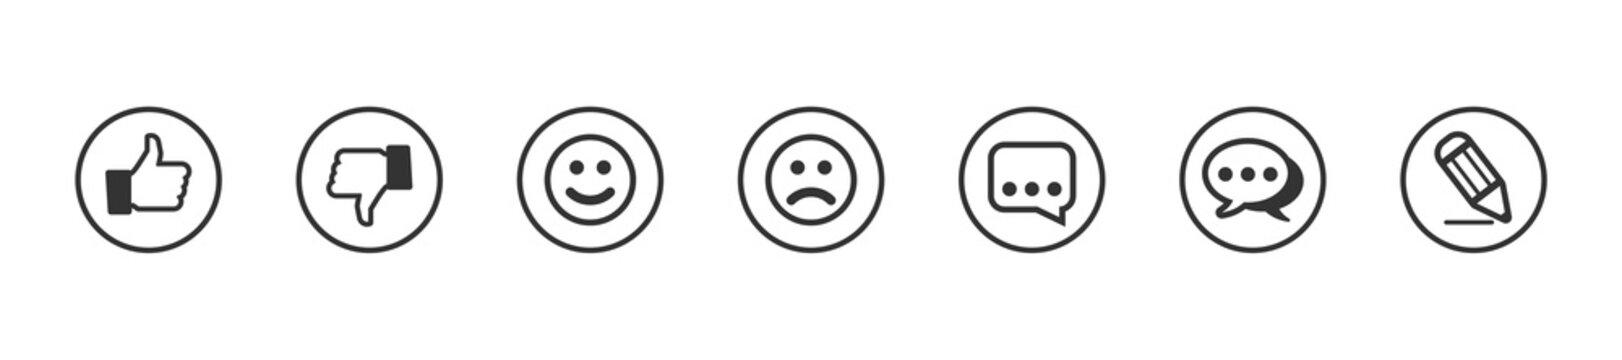 Feedback icon button set